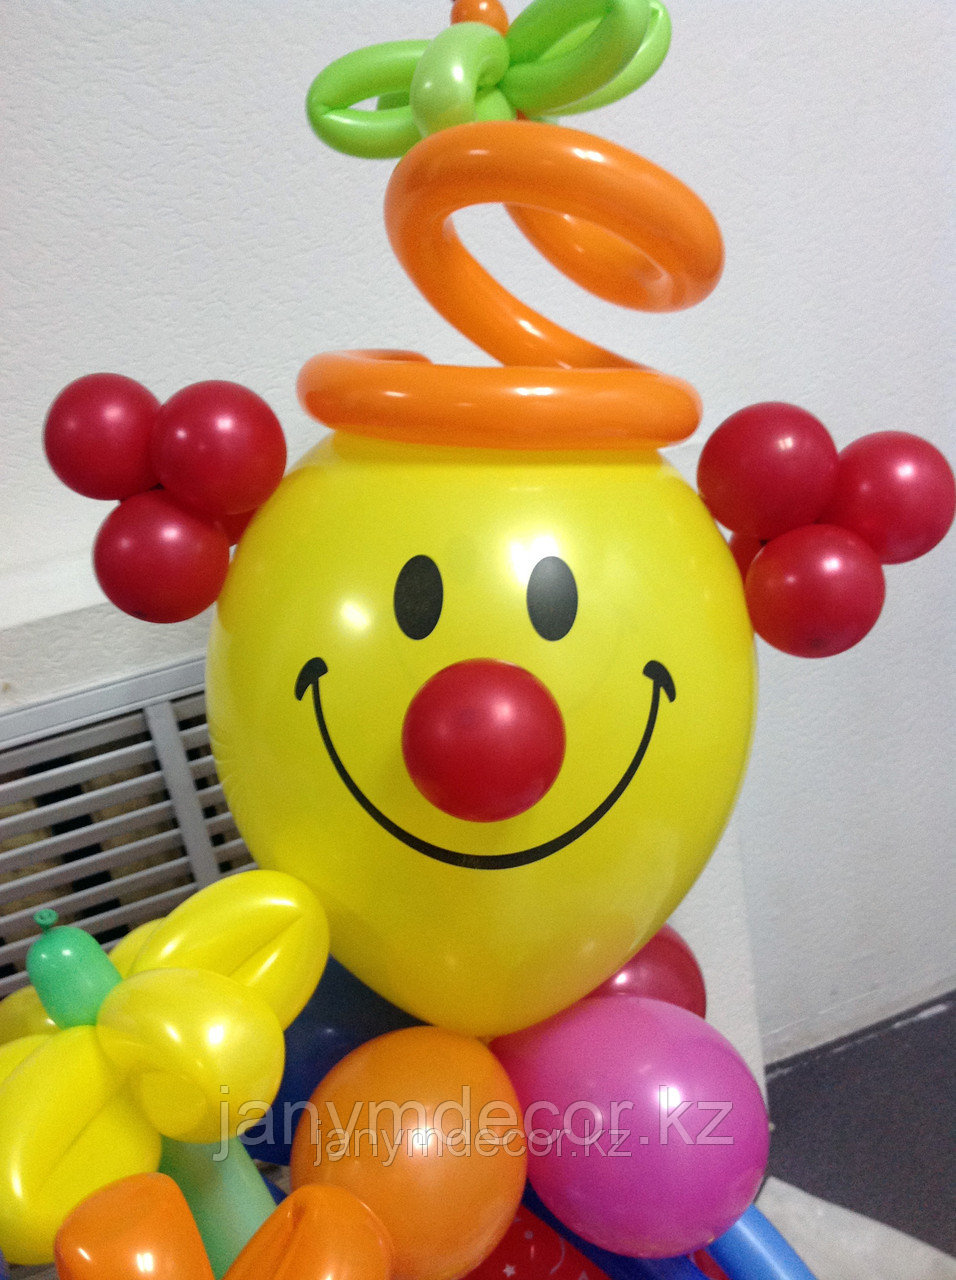 Клоун с букетом к 8 марта - фото 1